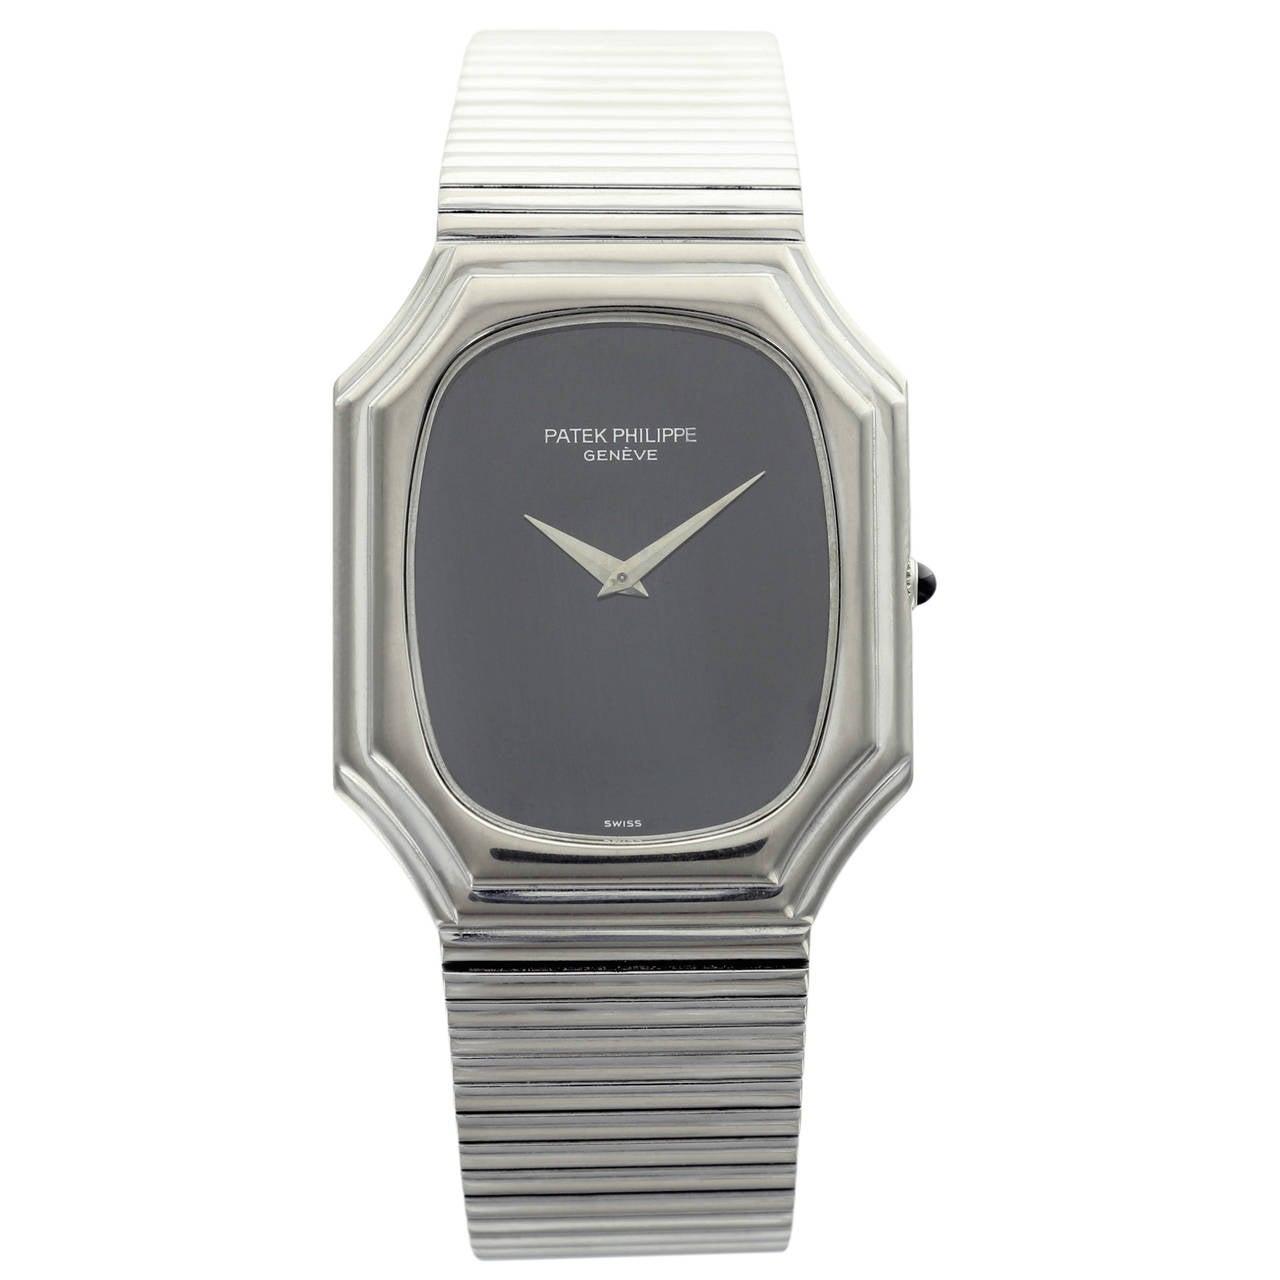 Patek Philippe White Gold Black Dial Wristwatch Ref 3729 1